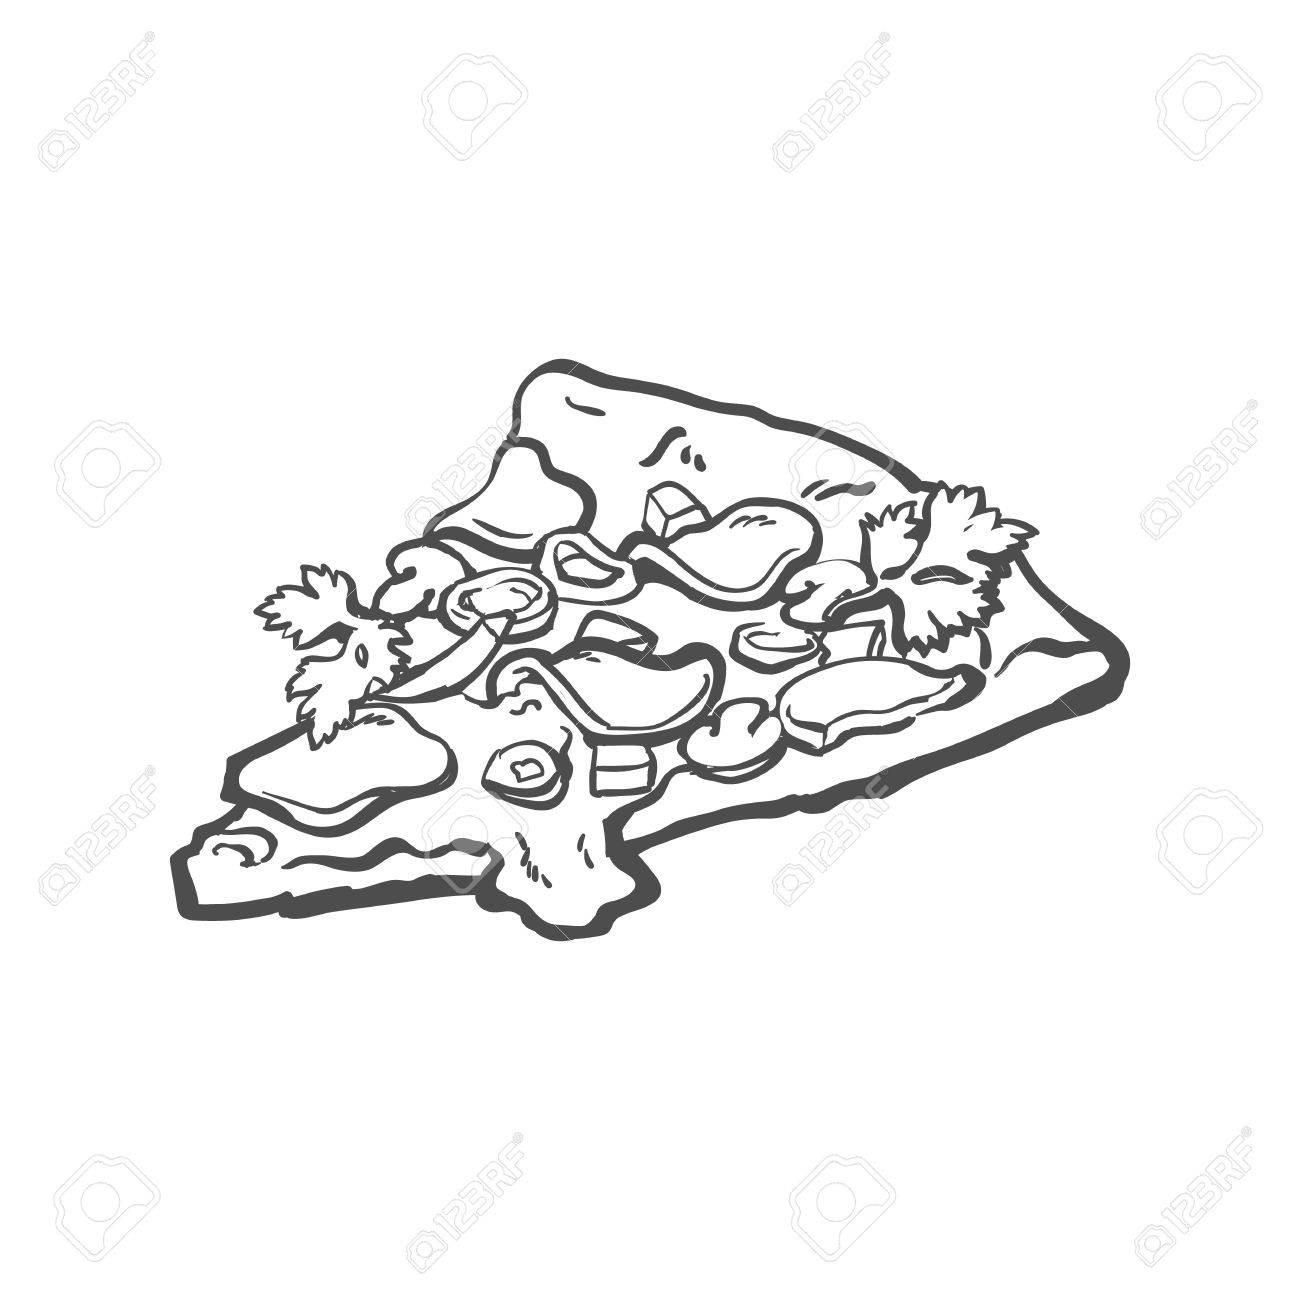 1300x1300 Vector Sketch Pizza Slice. Fast Food Cartoon Isolated Illustration